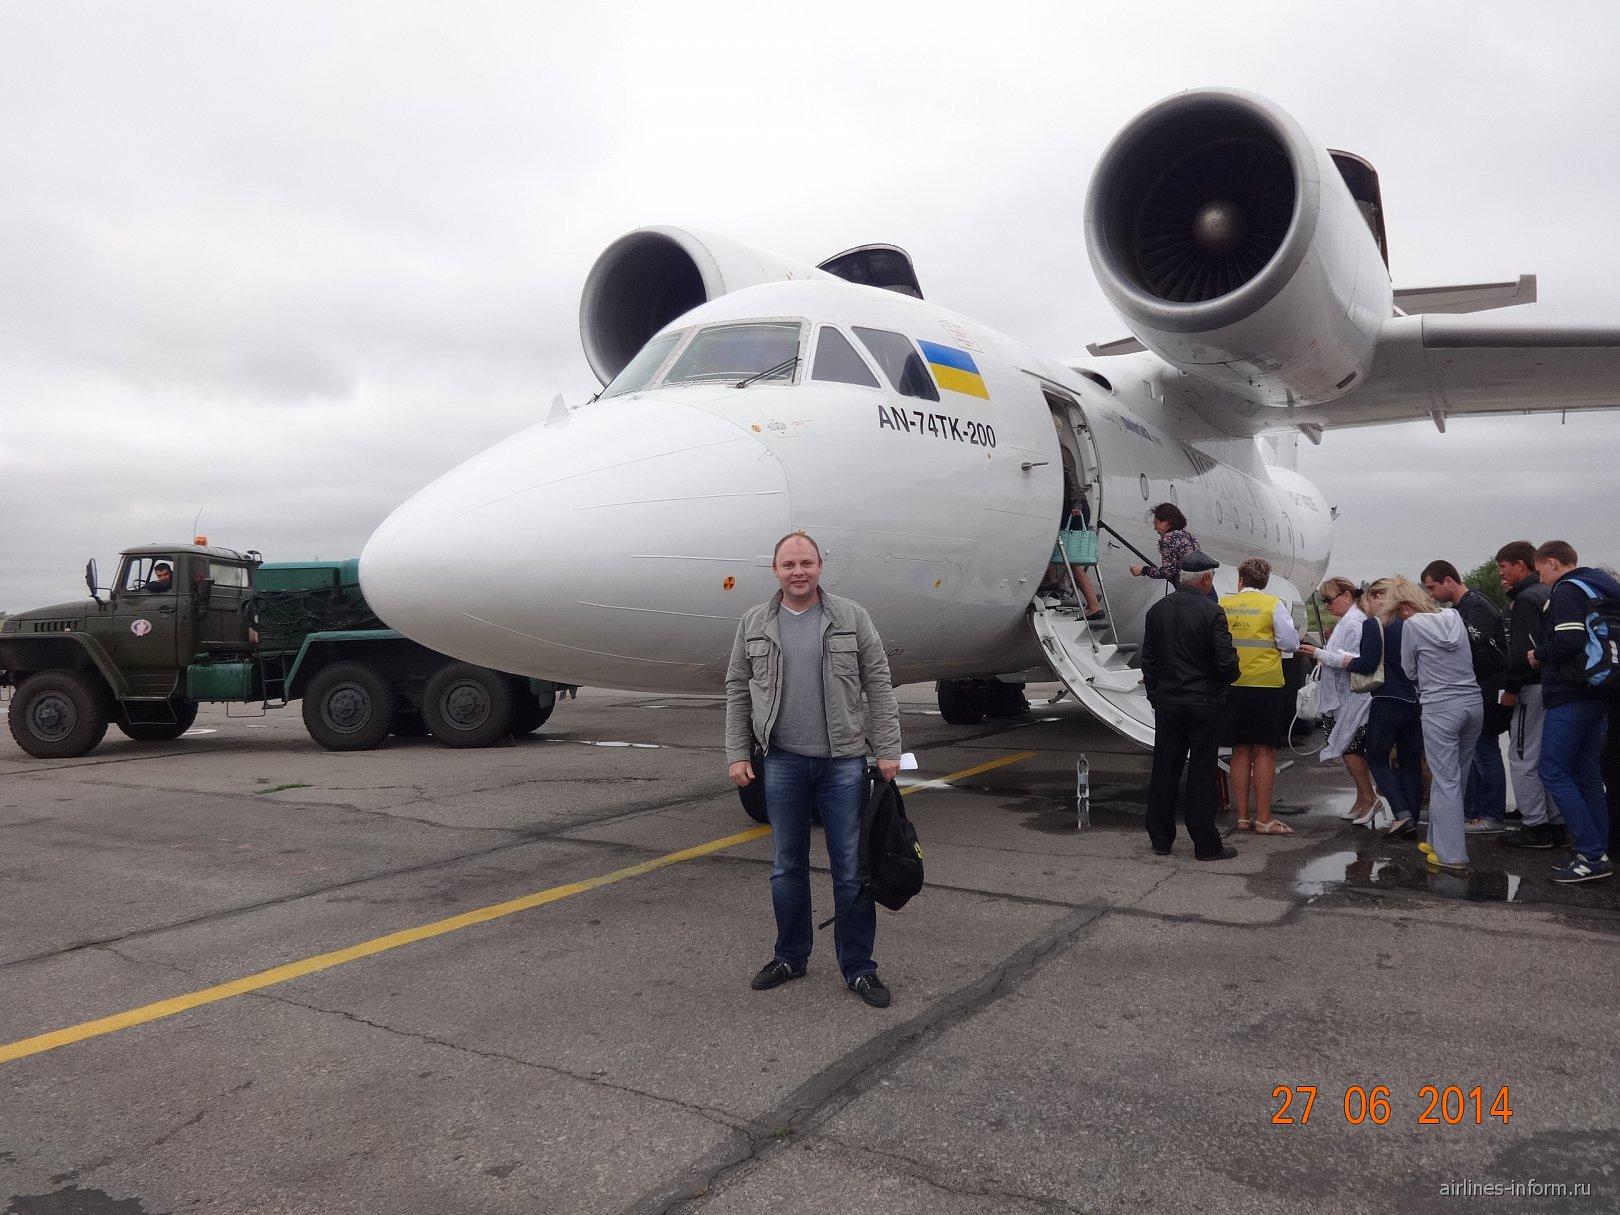 Самолет Ан-74ТК-200 авиакомпании Мотор-Сич